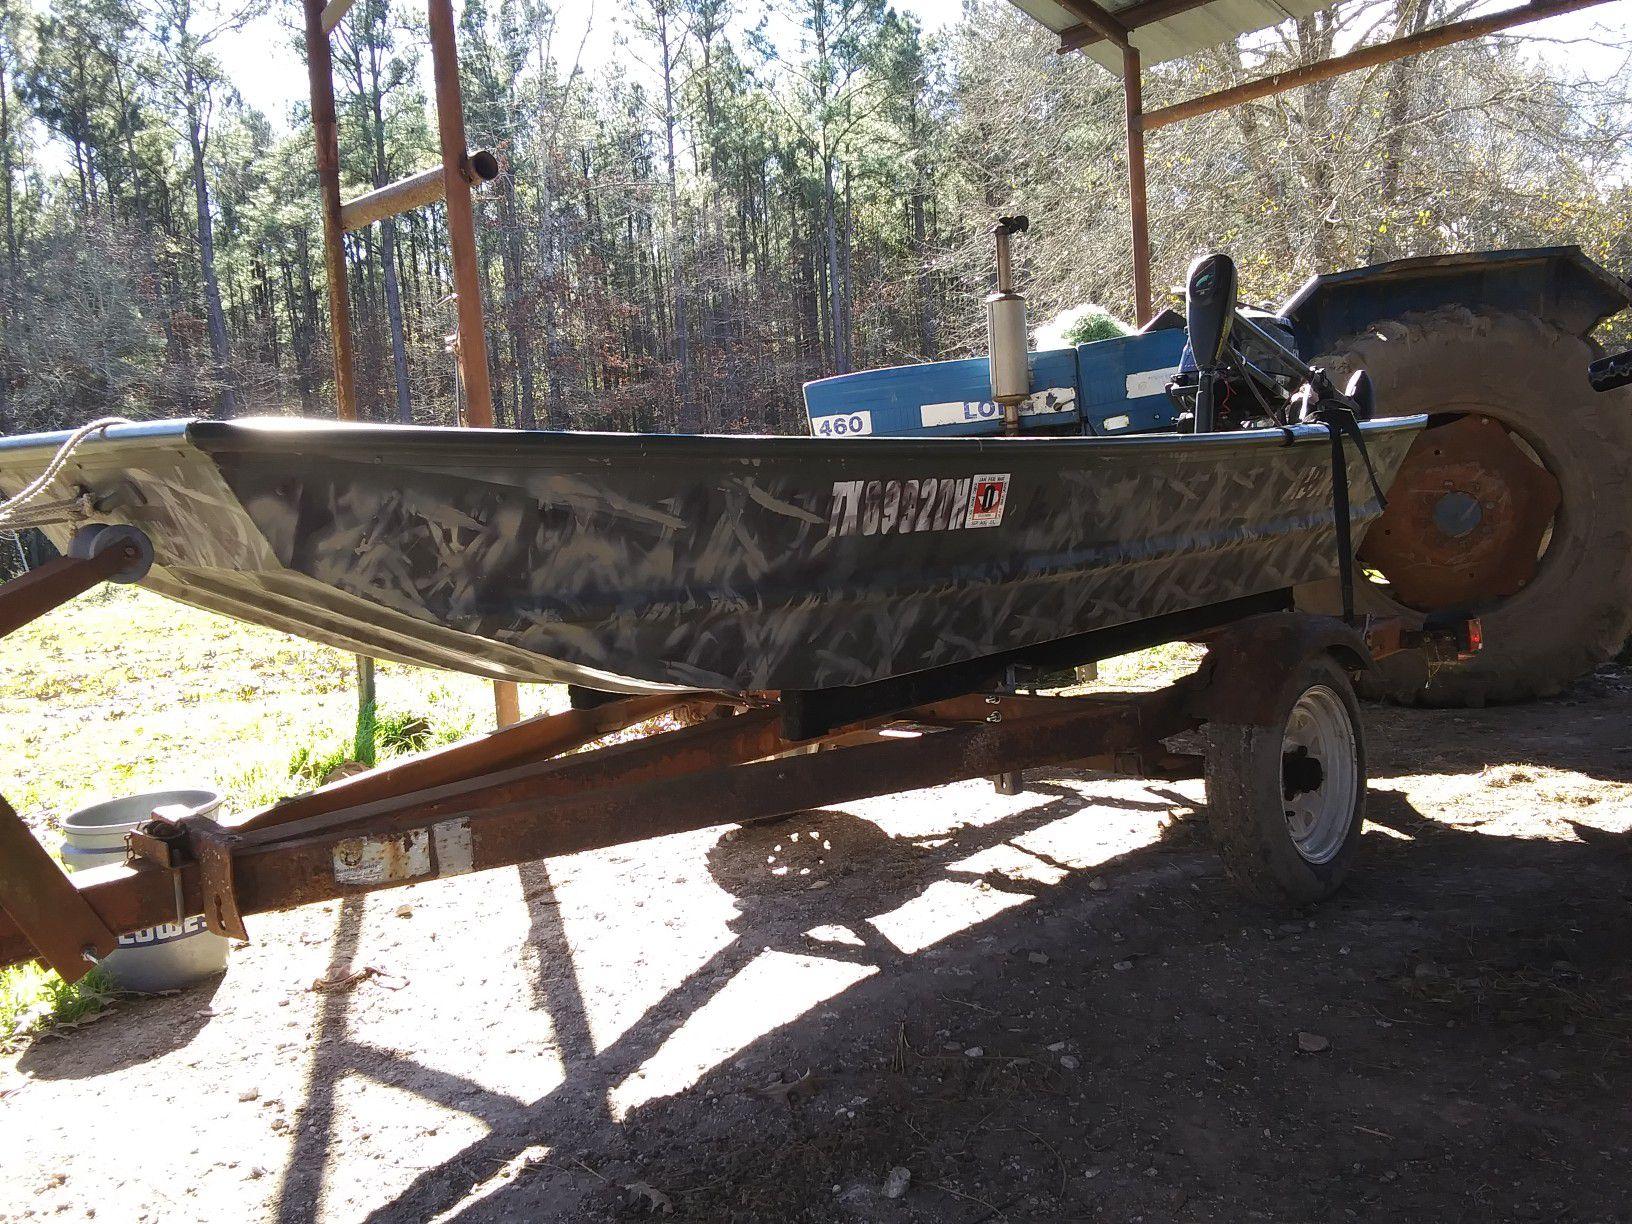 Photo 10ft alumacraft jon boat with 2.5 outboard moror